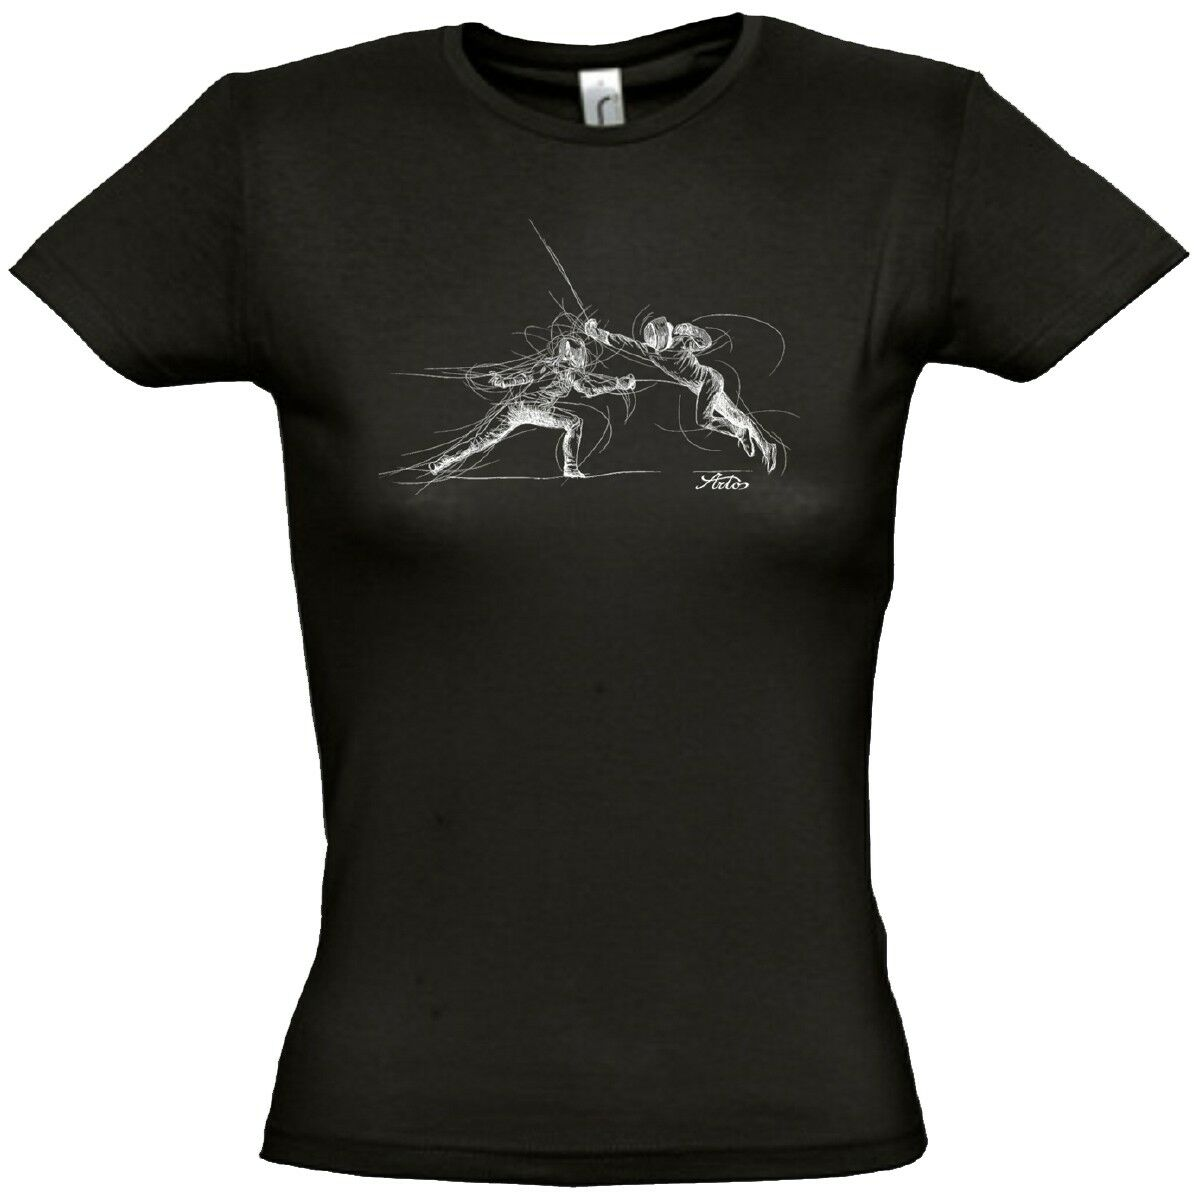 Artos Fechtmotiv Women Camiseta womenes Deporte Ocio whiteo y black 5603